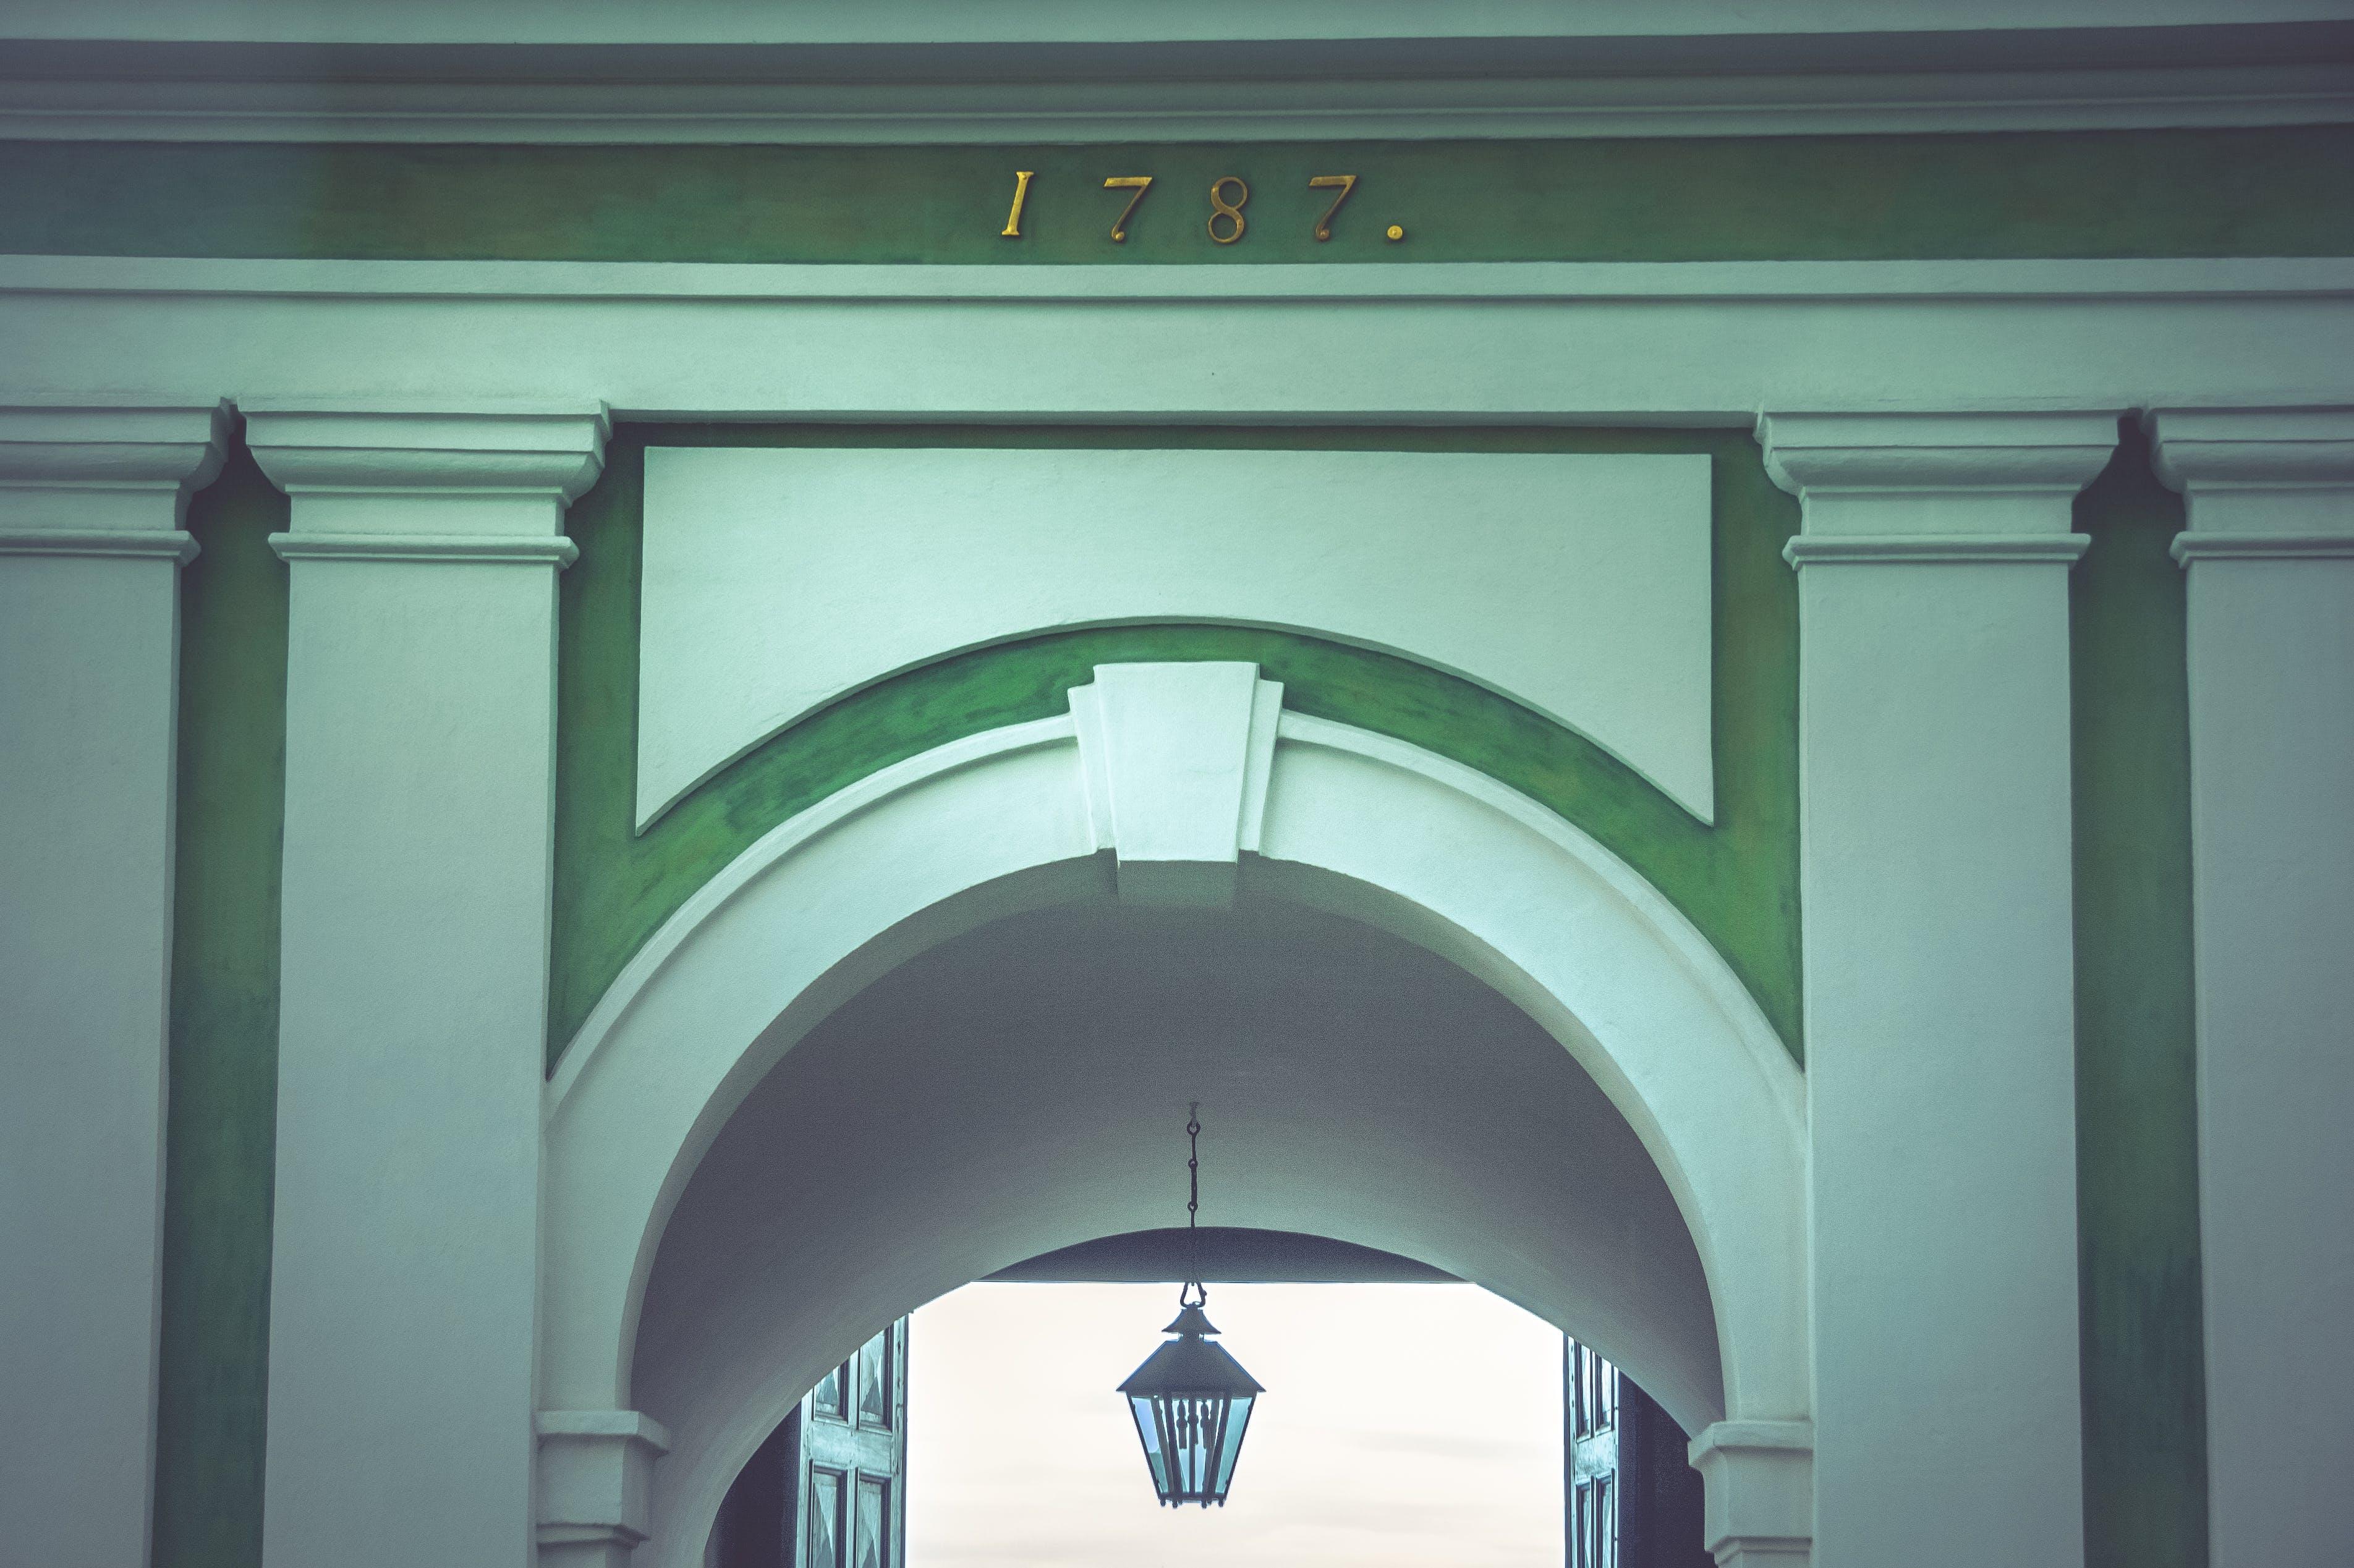 arches, architecture, art